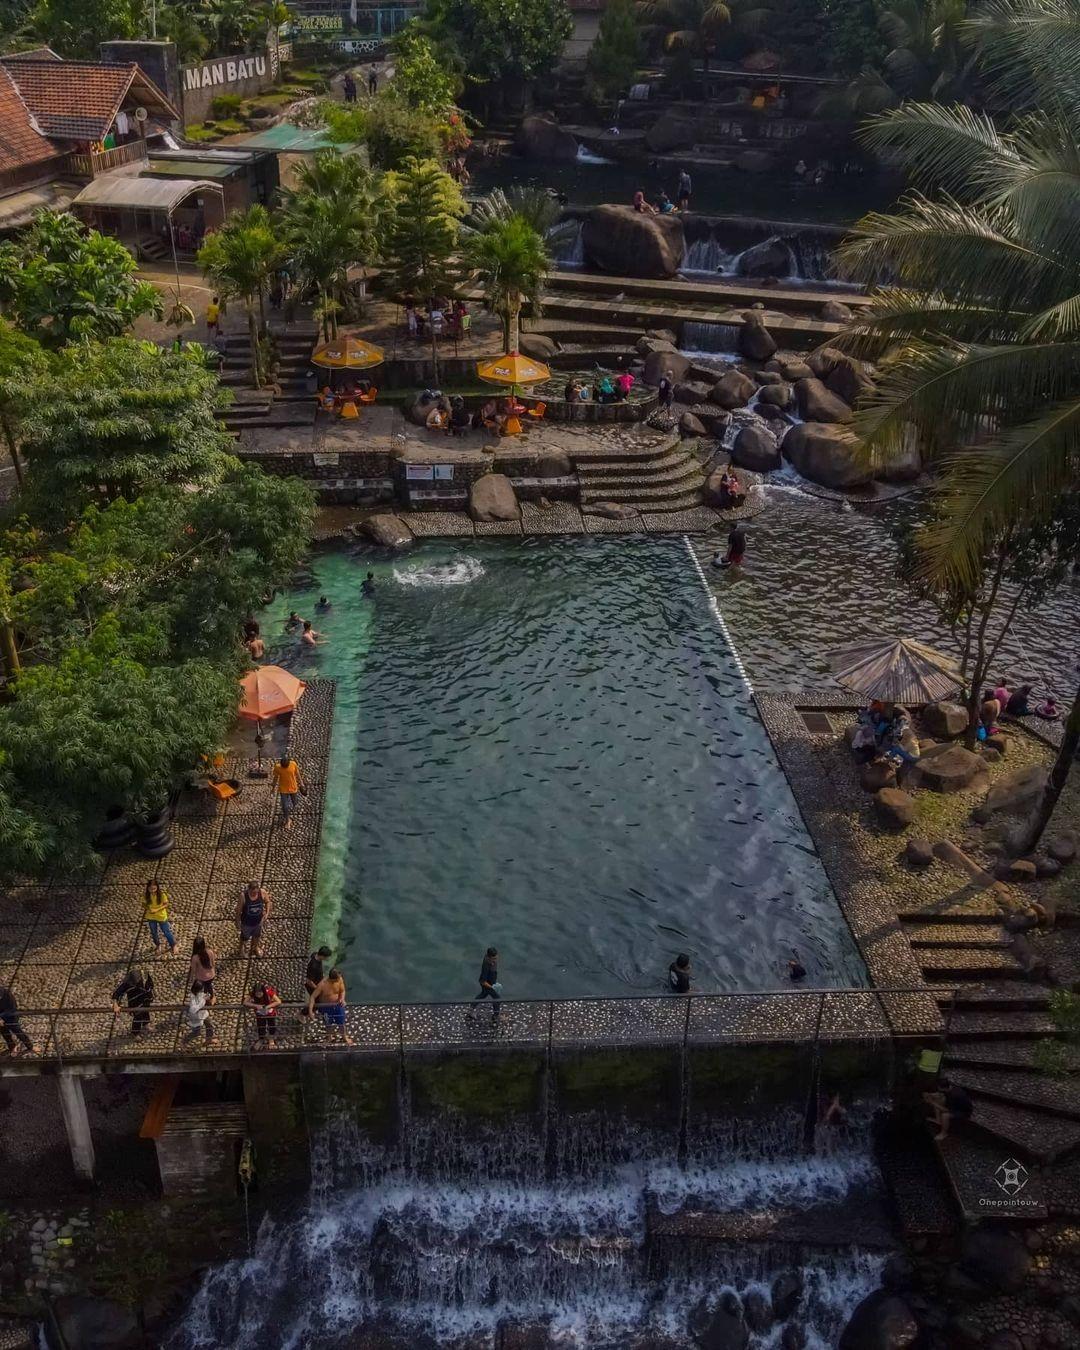 Kolam Yang Ada Di Taman Batu Purwakarta Image From @onepointouw_